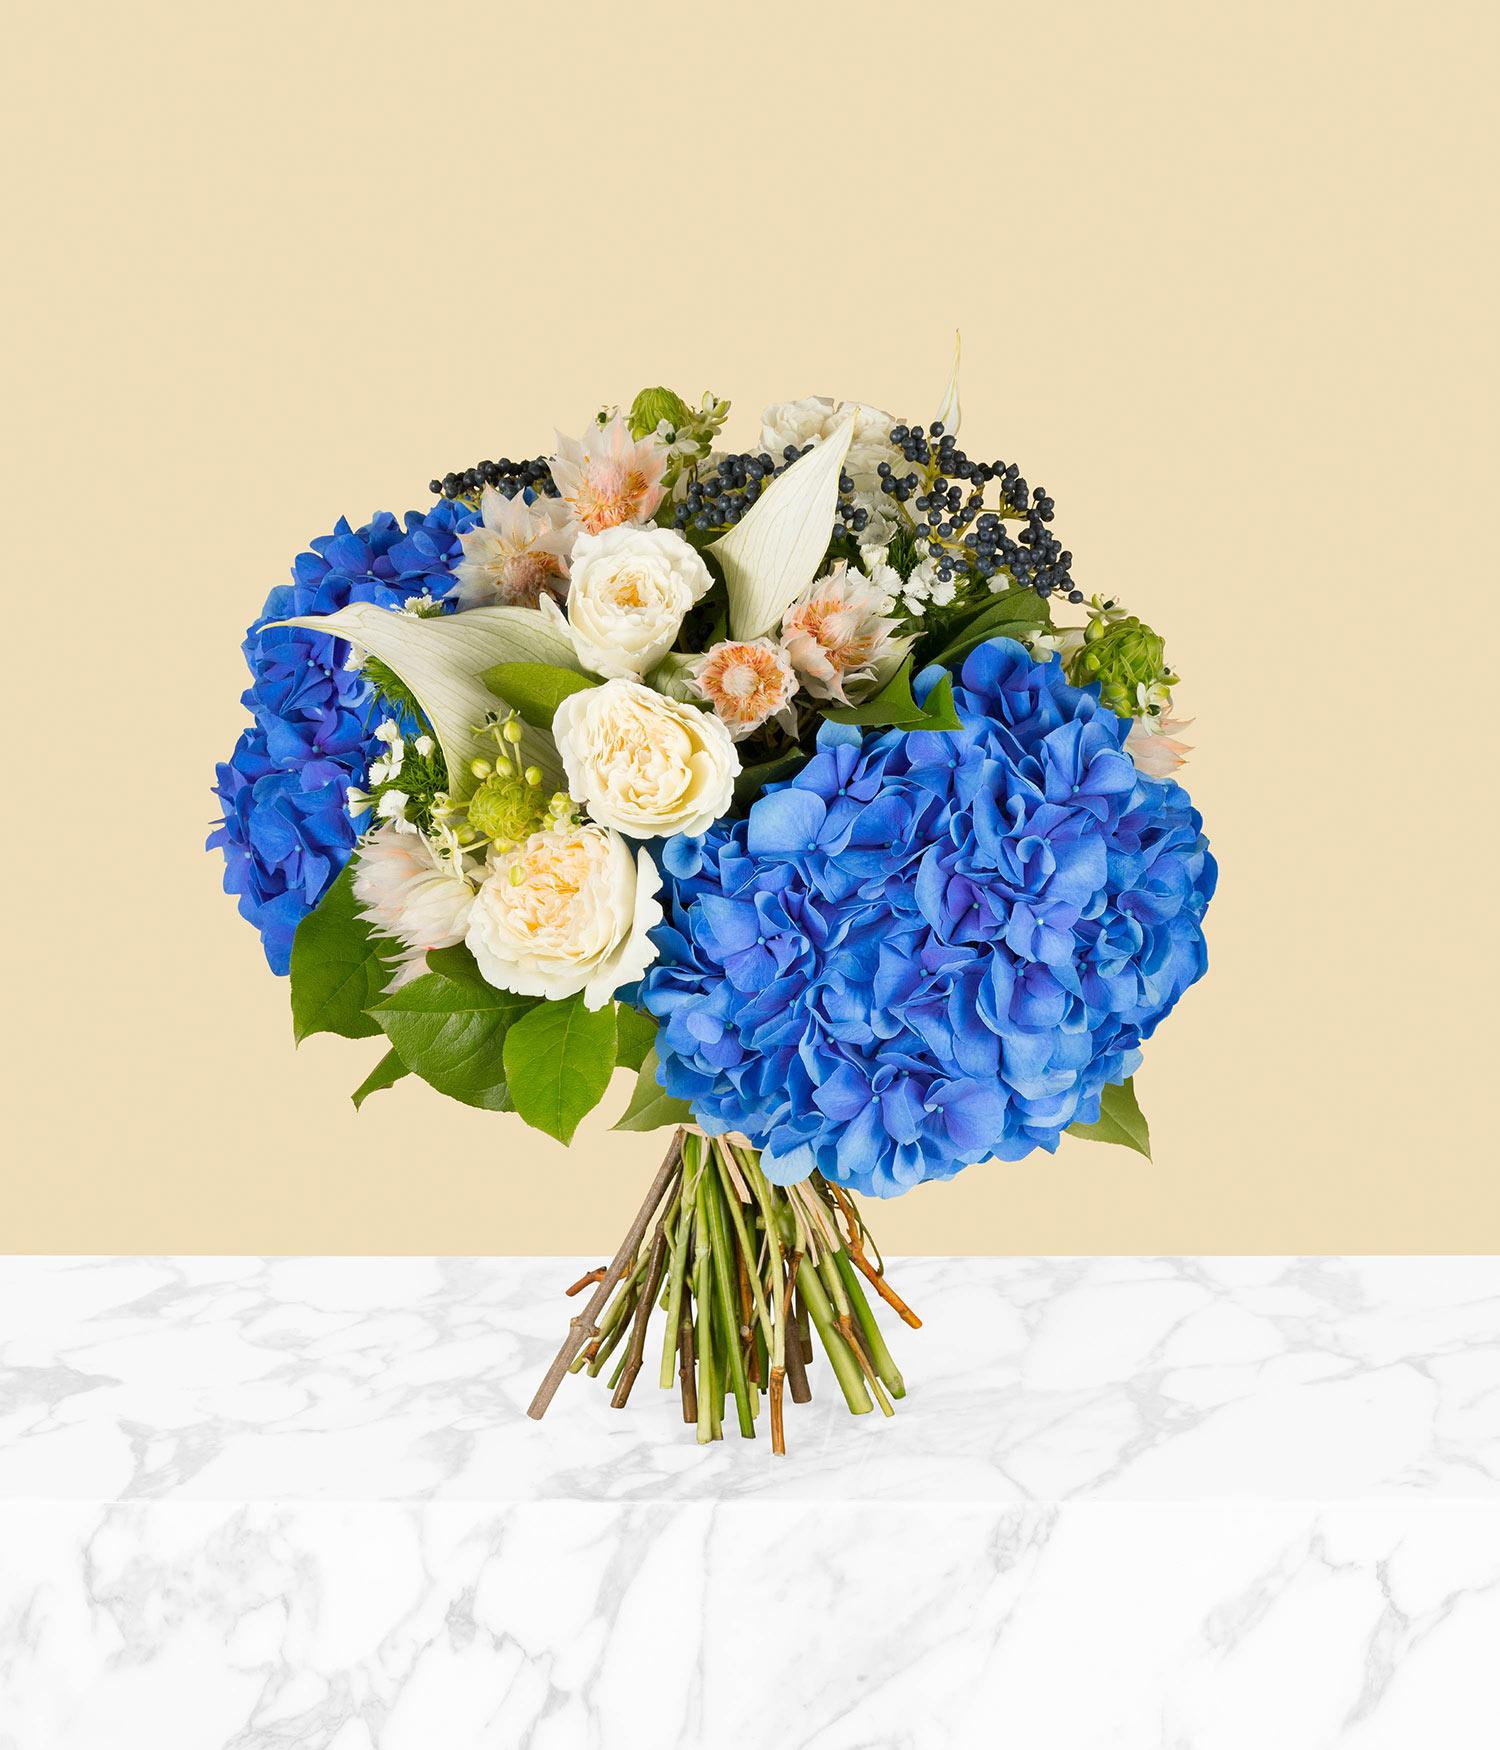 O'Keeffe Blue Hydrangea and Rose Flower Bouquet by flannel flowers